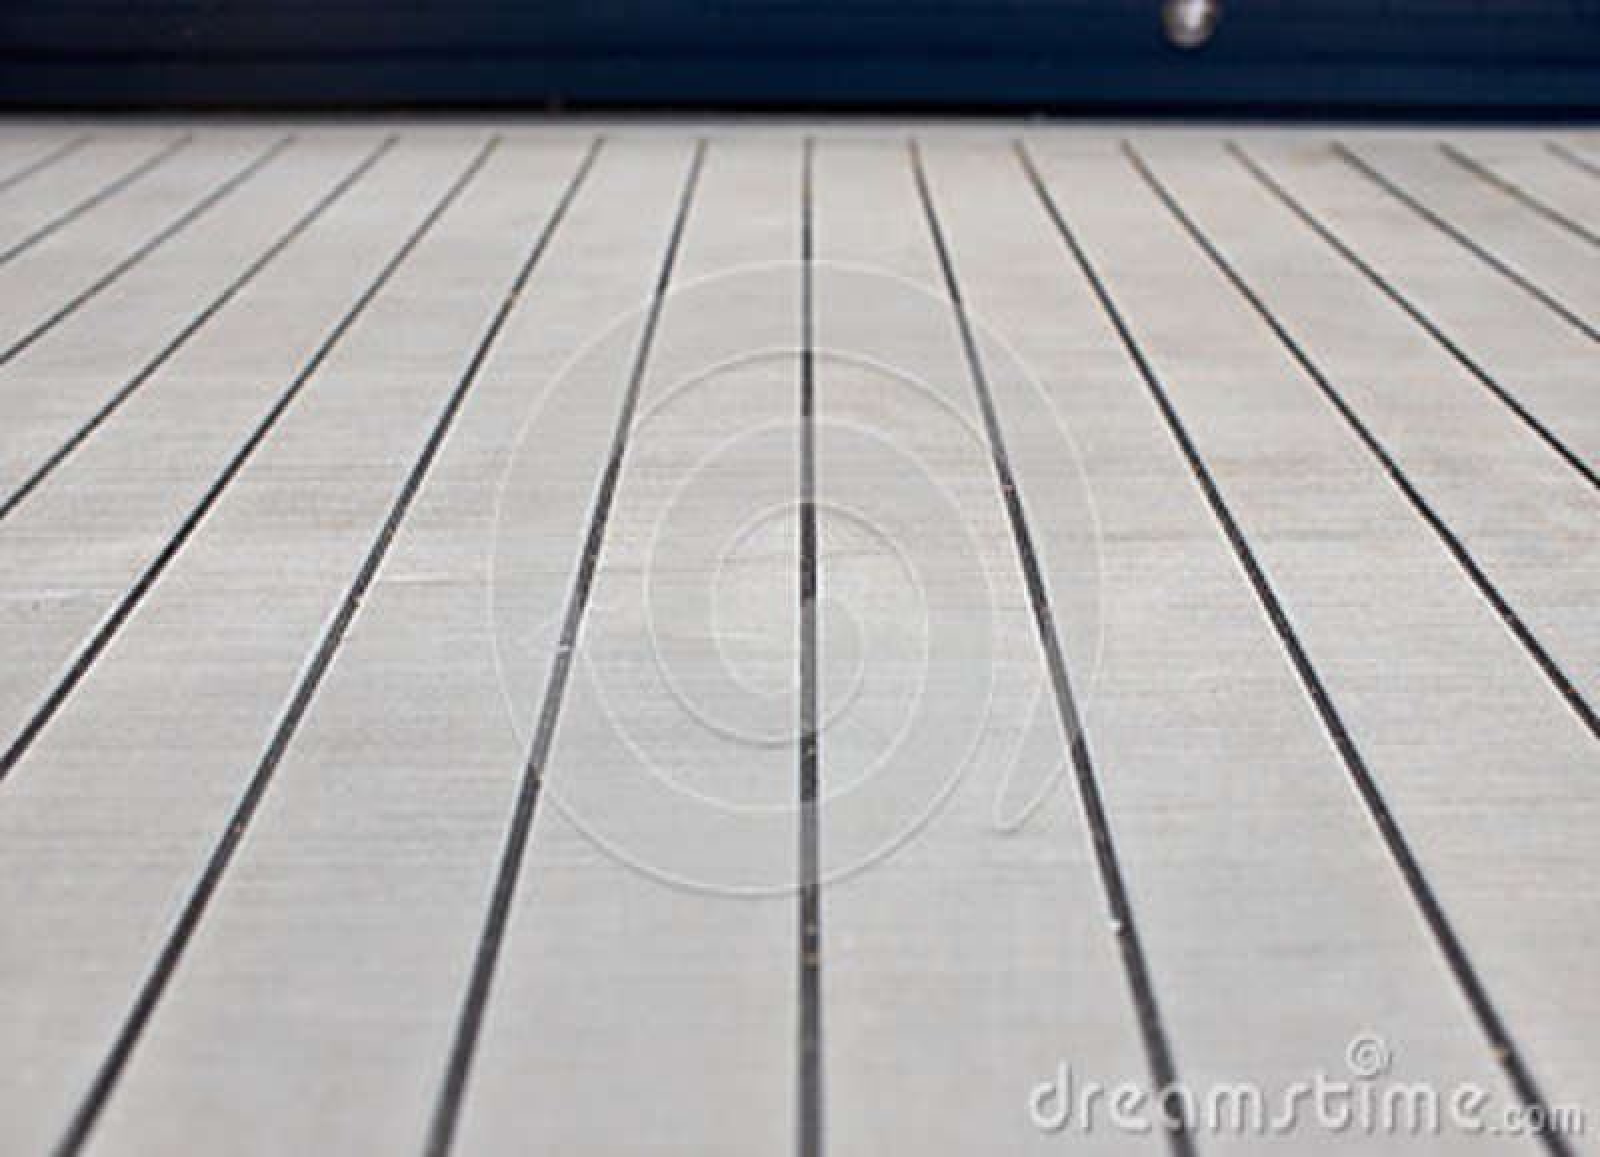 Planks on cruise ship